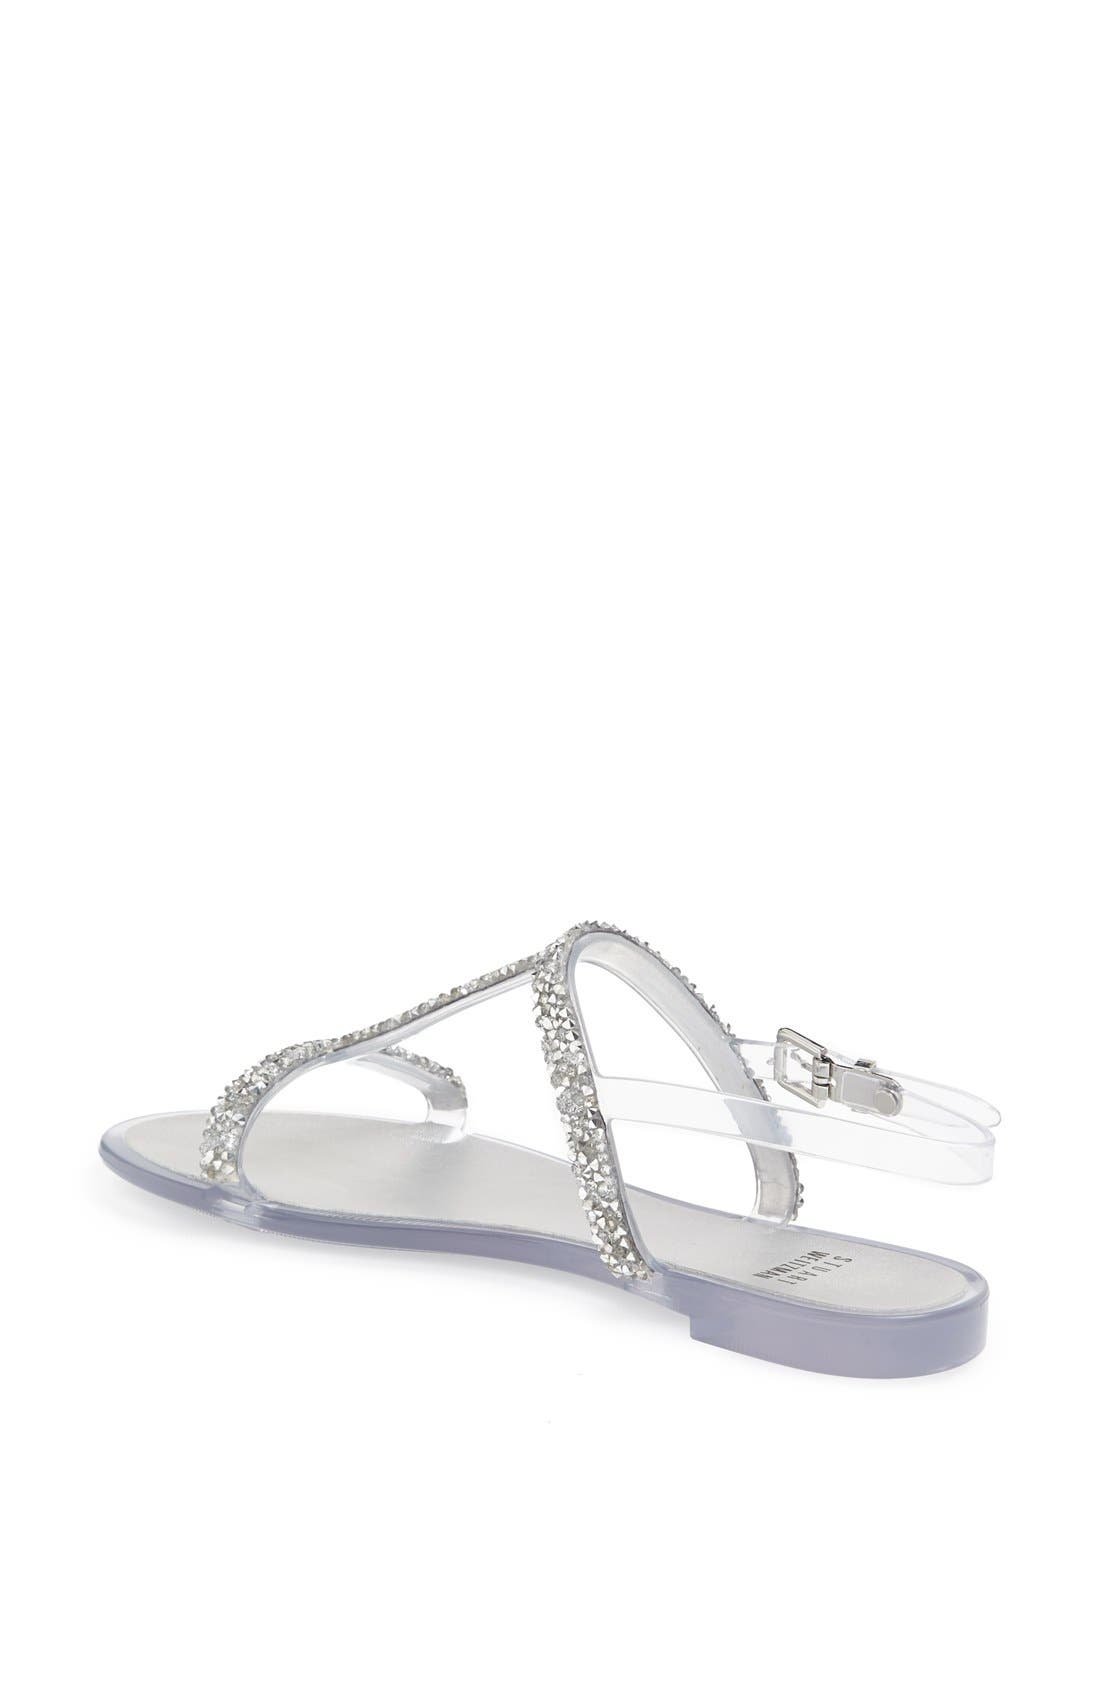 Alternate Image 2  - Stuart Weitzman 'Teezer' Sandal